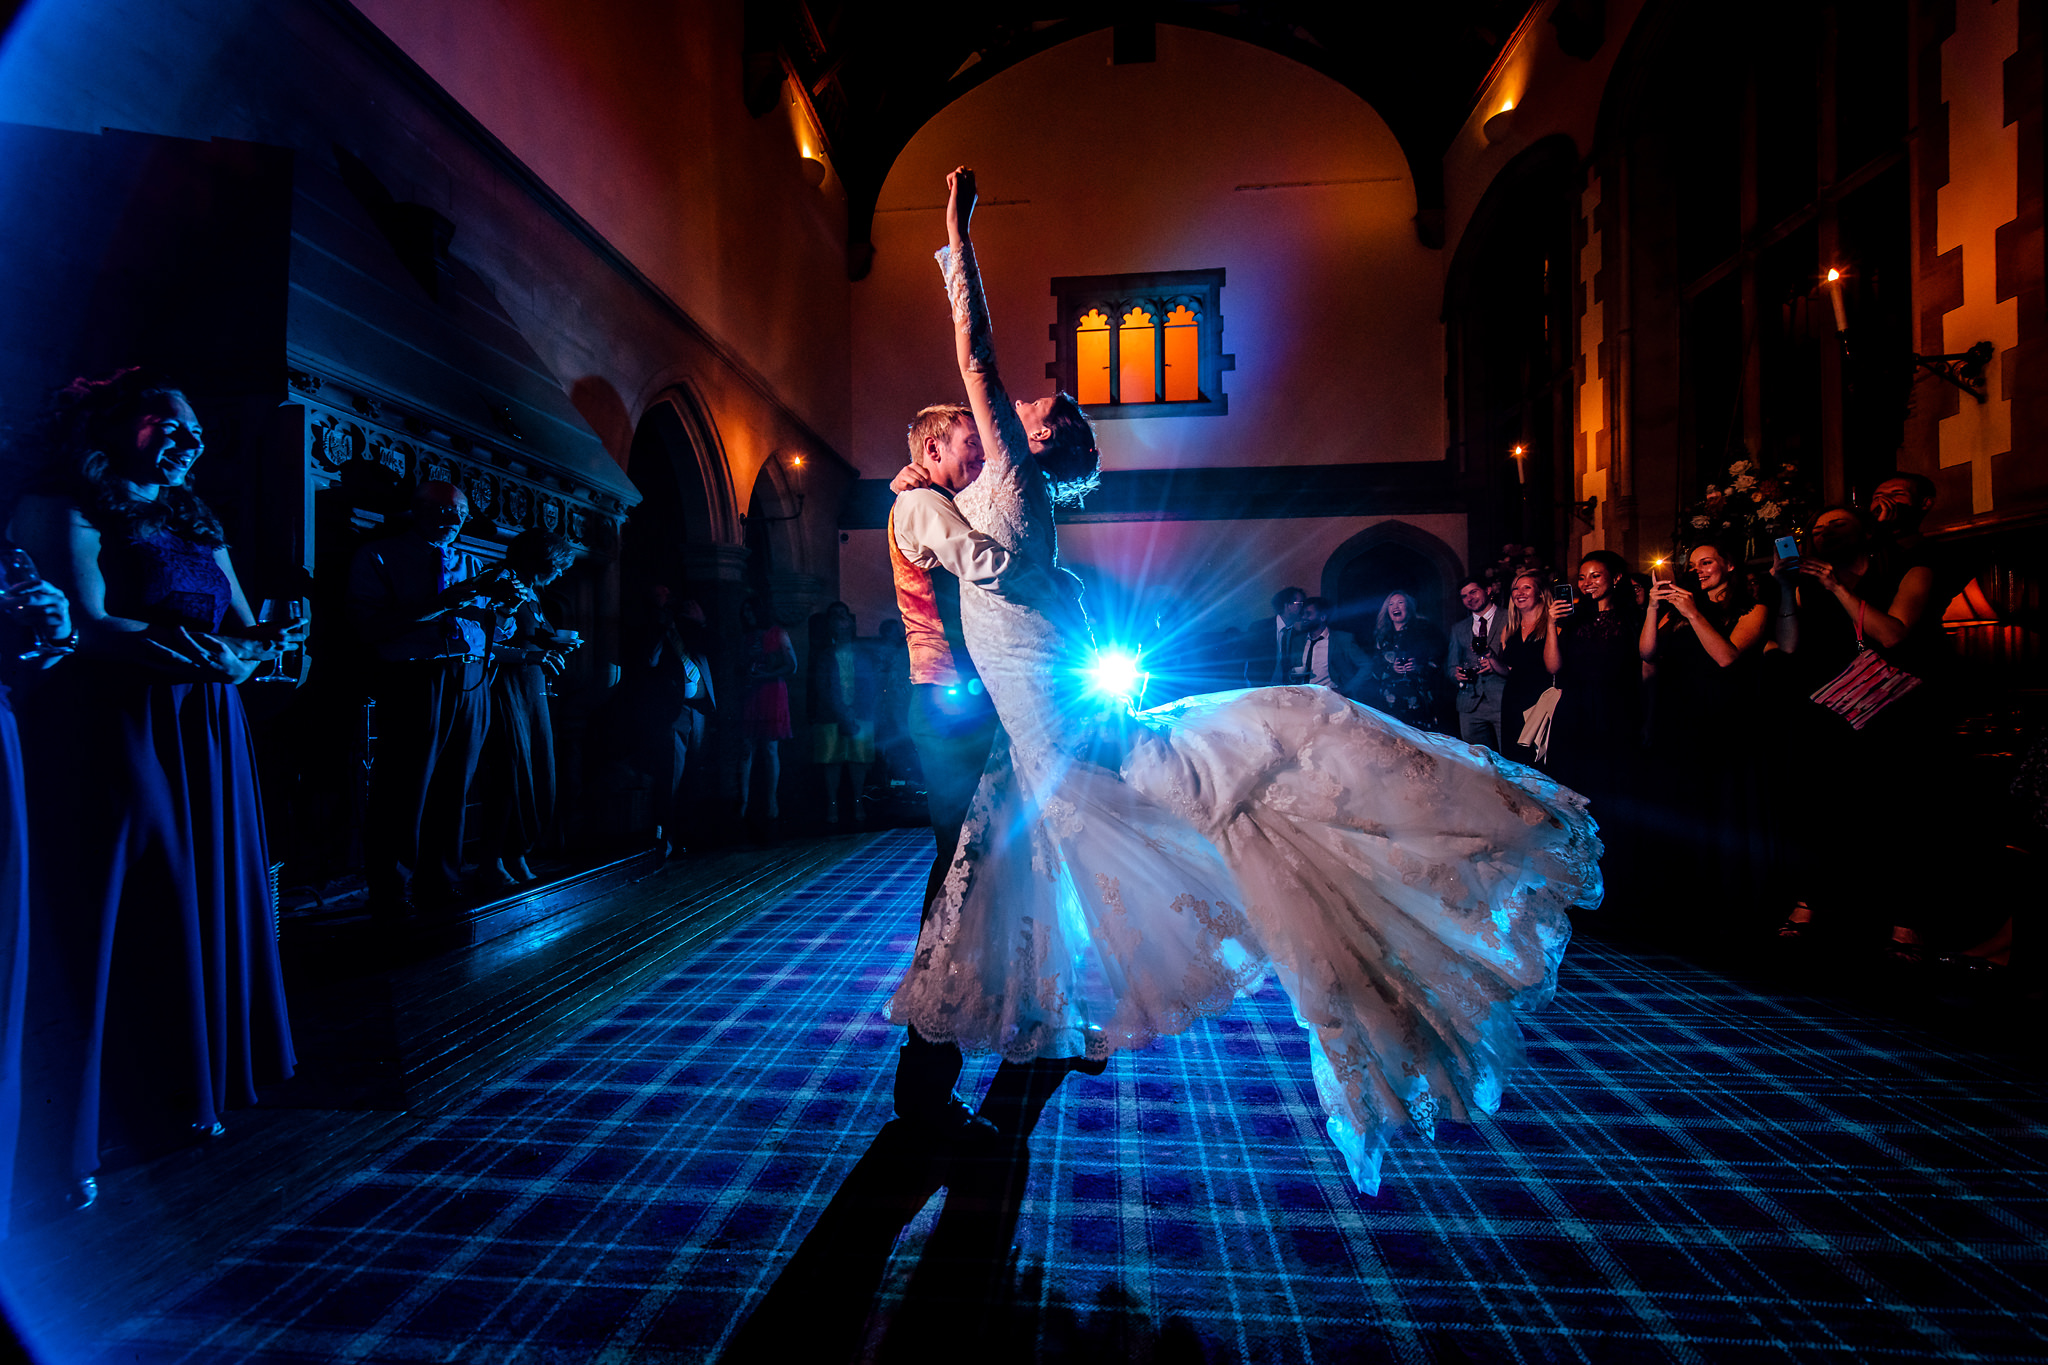 groom-dances-bride-off-her-feet-rich-howman